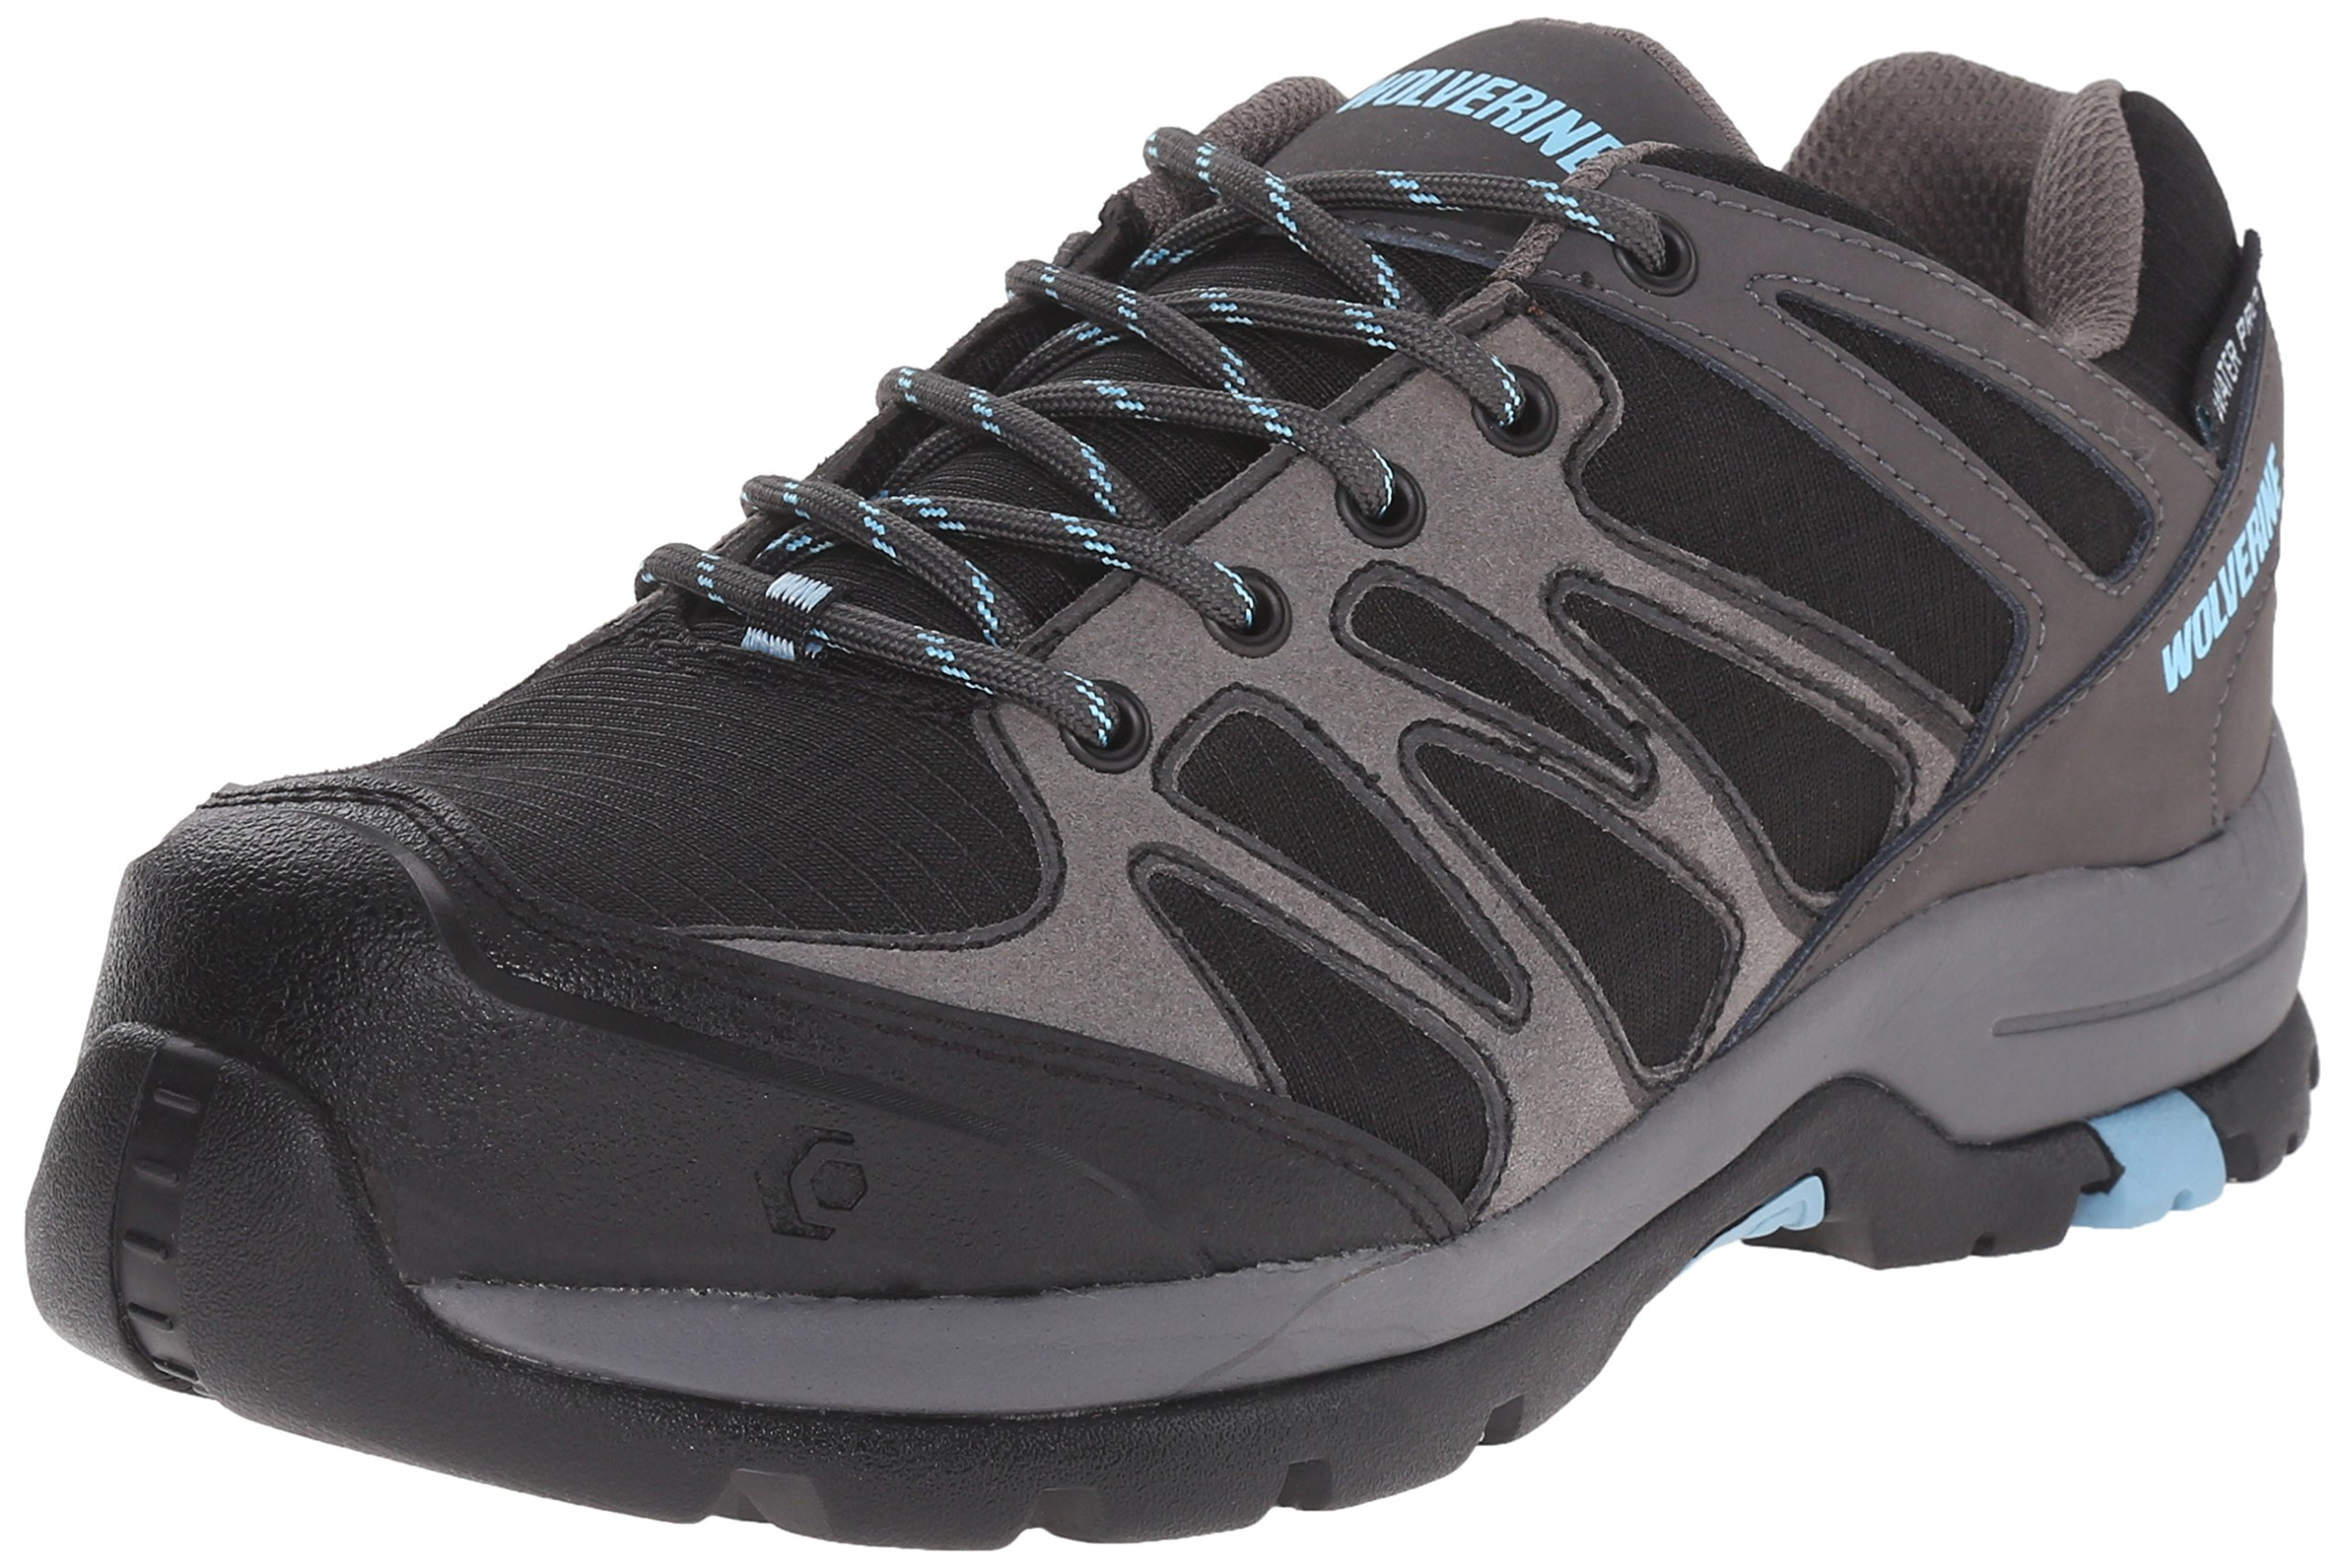 Wolverine Women's Fletcher Low Work Shoe, Black/Blue, 5 M US